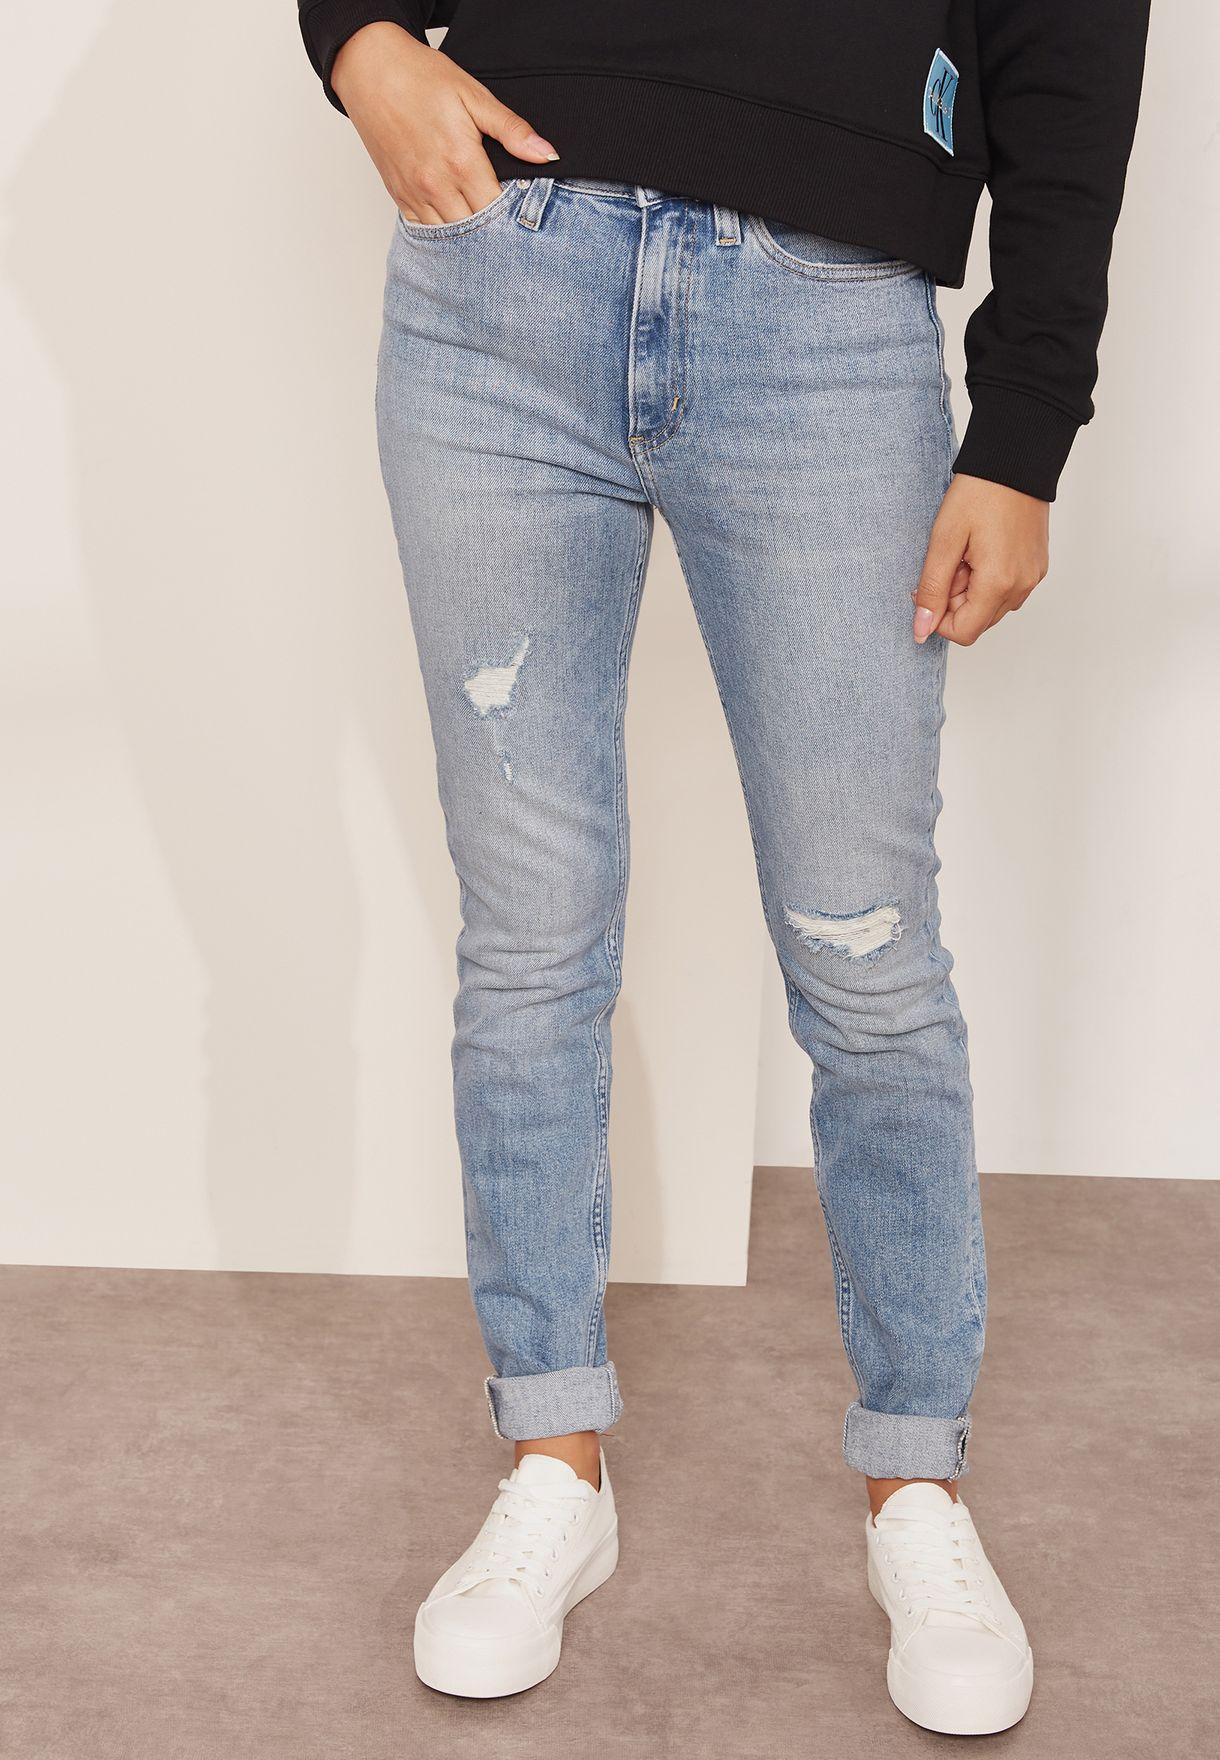 14a9c81c6d5 Shop Calvin Klein Jeans blue Ripped High Waist Skinny Jeans ...